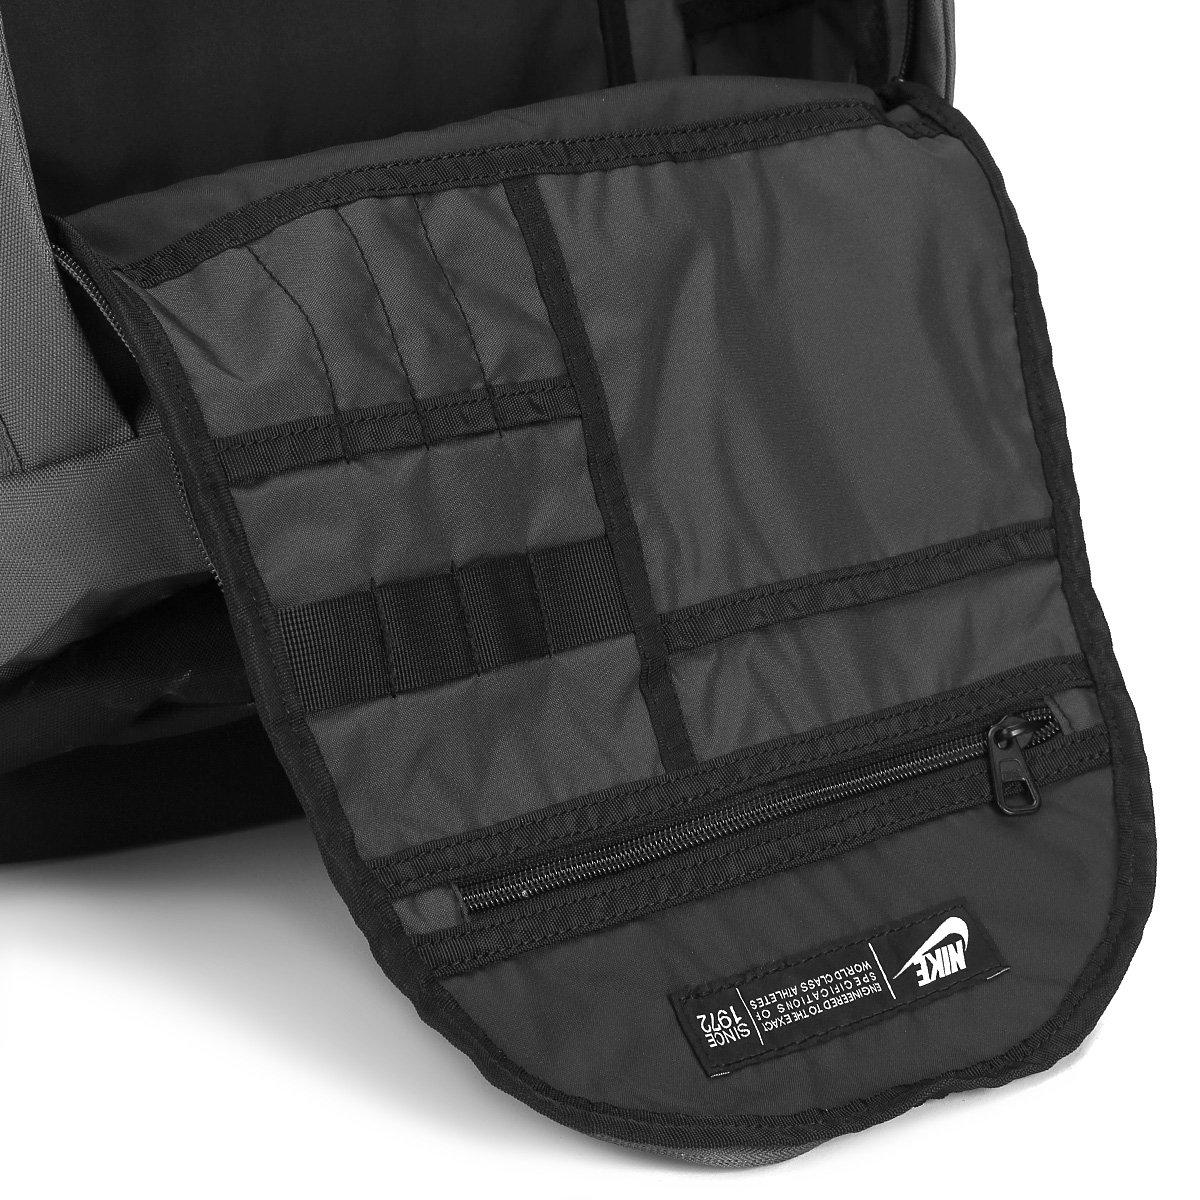 Mochila Compre Zattini Nike Solid 0 Cheyenne Agora 3 rrpqz7